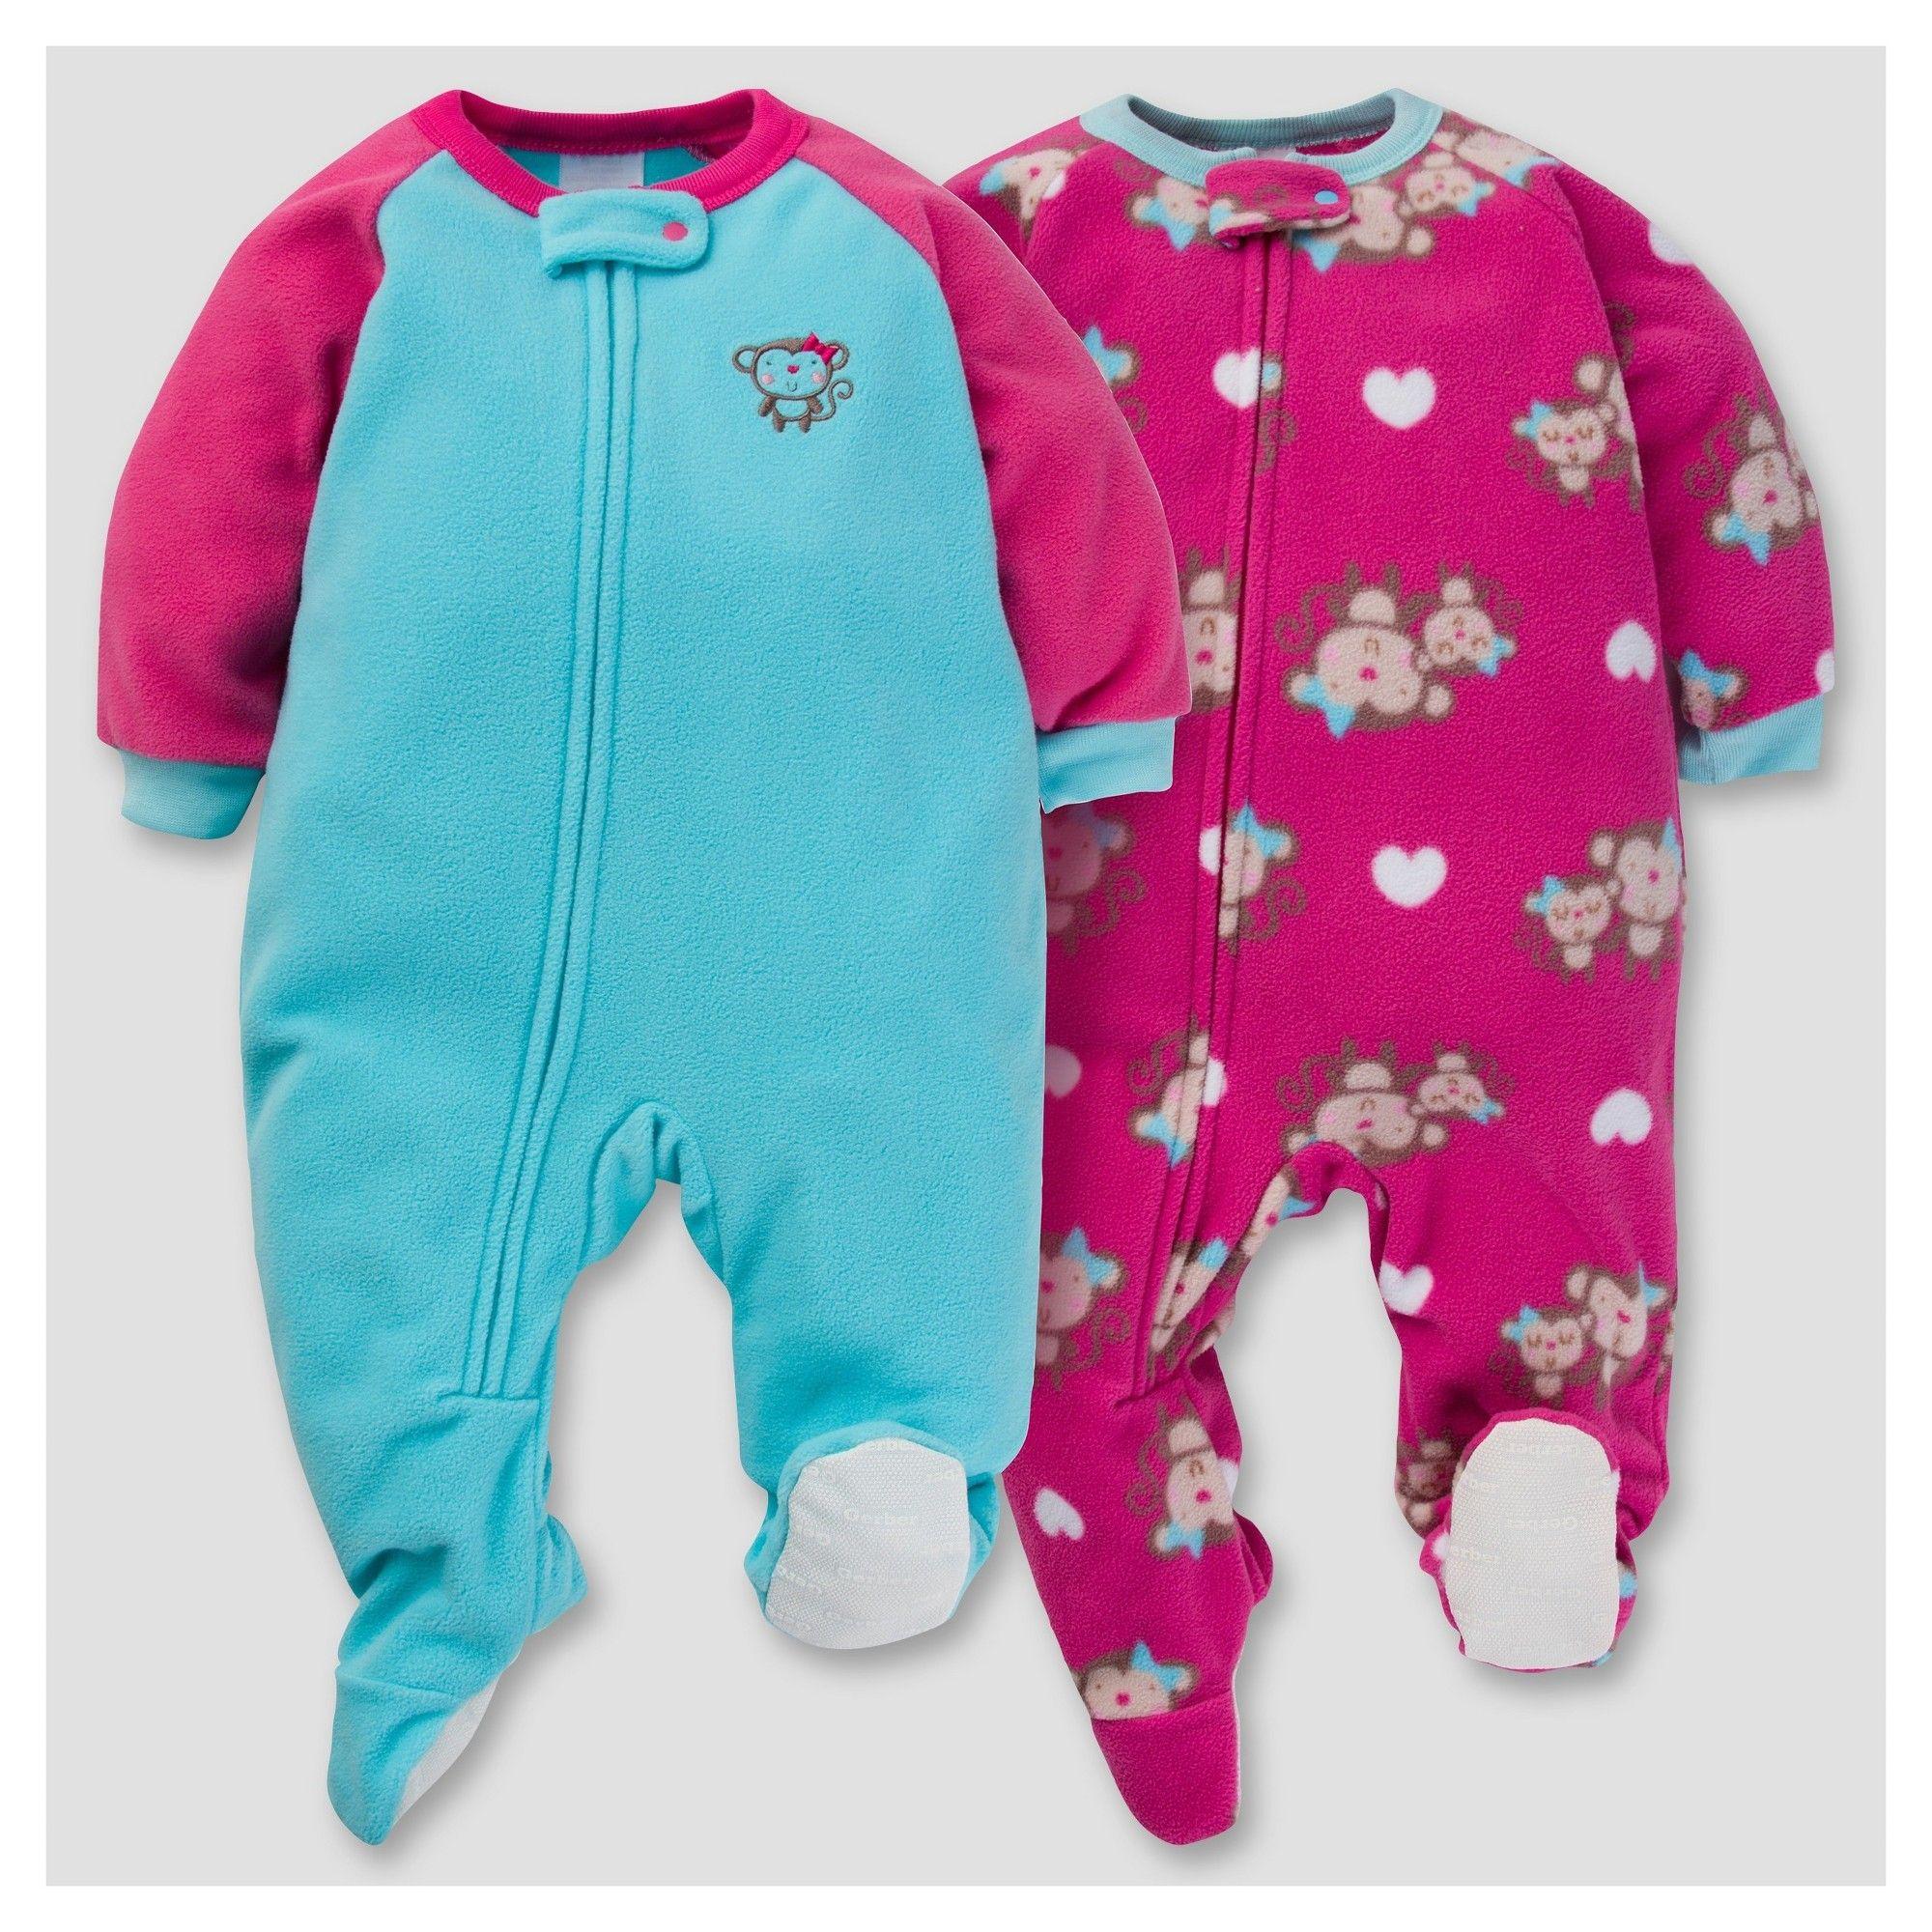 Gerber Baby Girl 2pk Happy Monkey Microfleece Zip-Front Footed Blanket  Sleepers - Turquoise 6-9 M a18077273